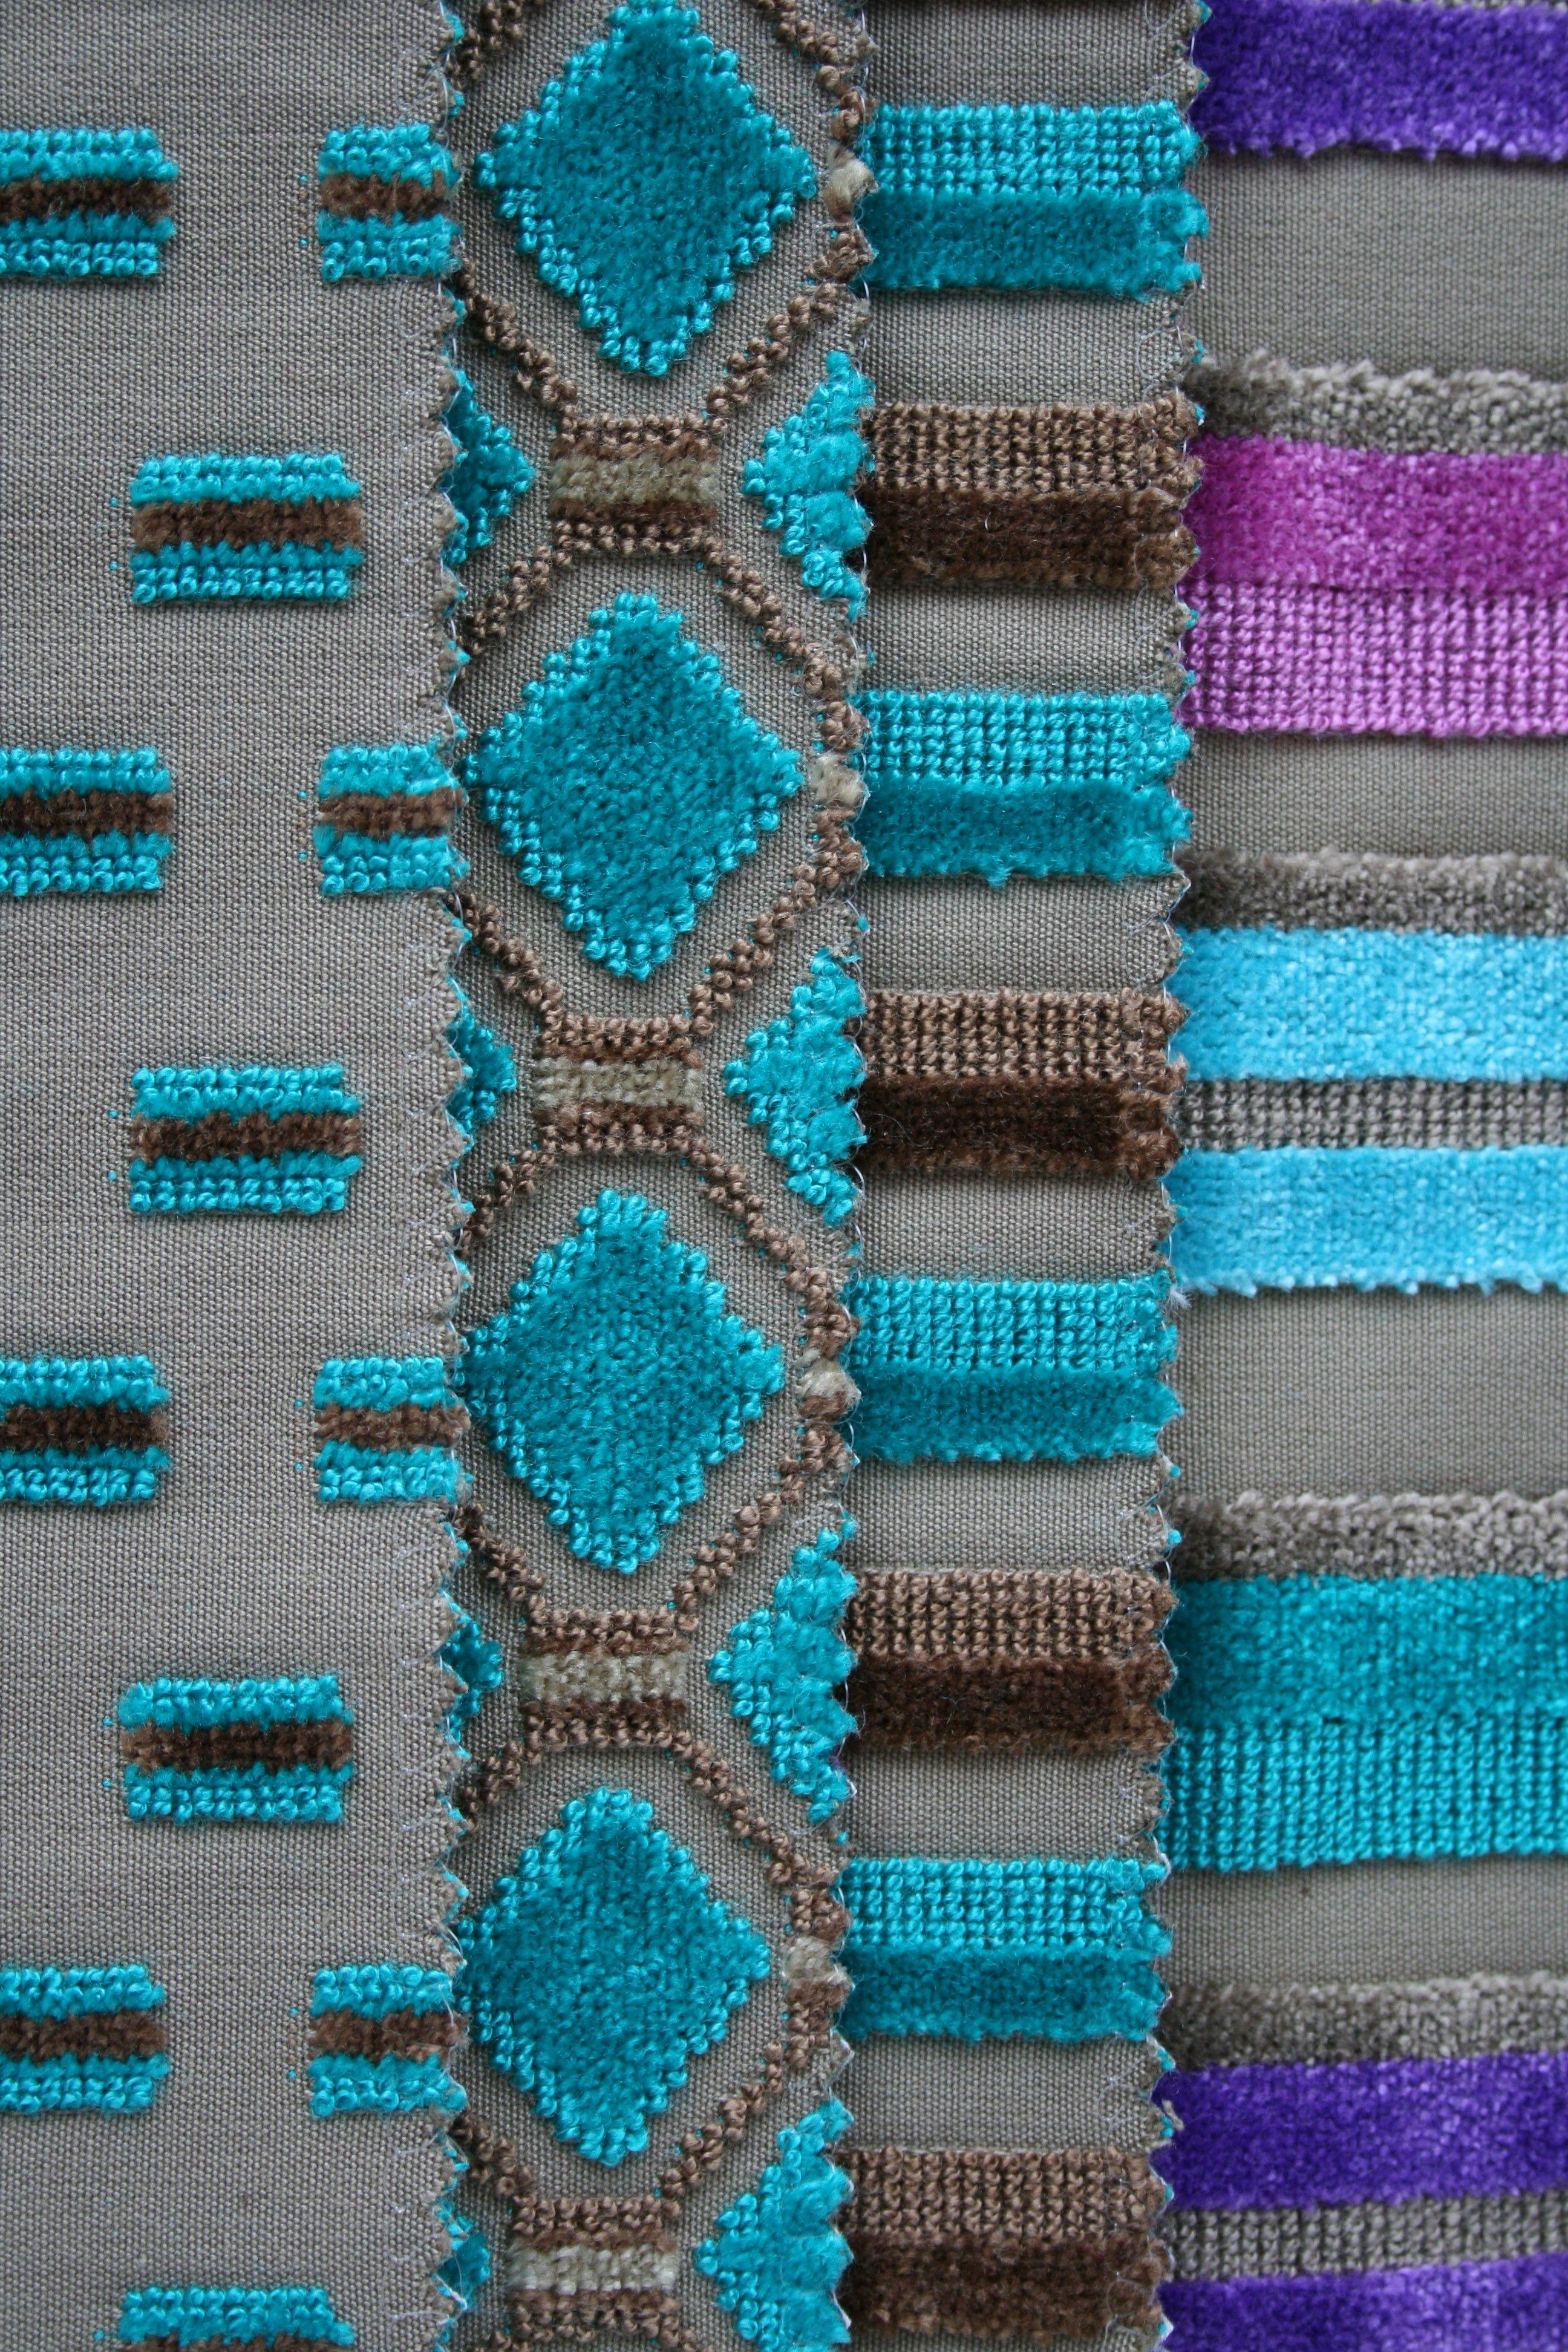 Casamance telas ideales de dibujo peque o ideal para tapizar sillas fabric pinterest - Telas tapizar sillas ...